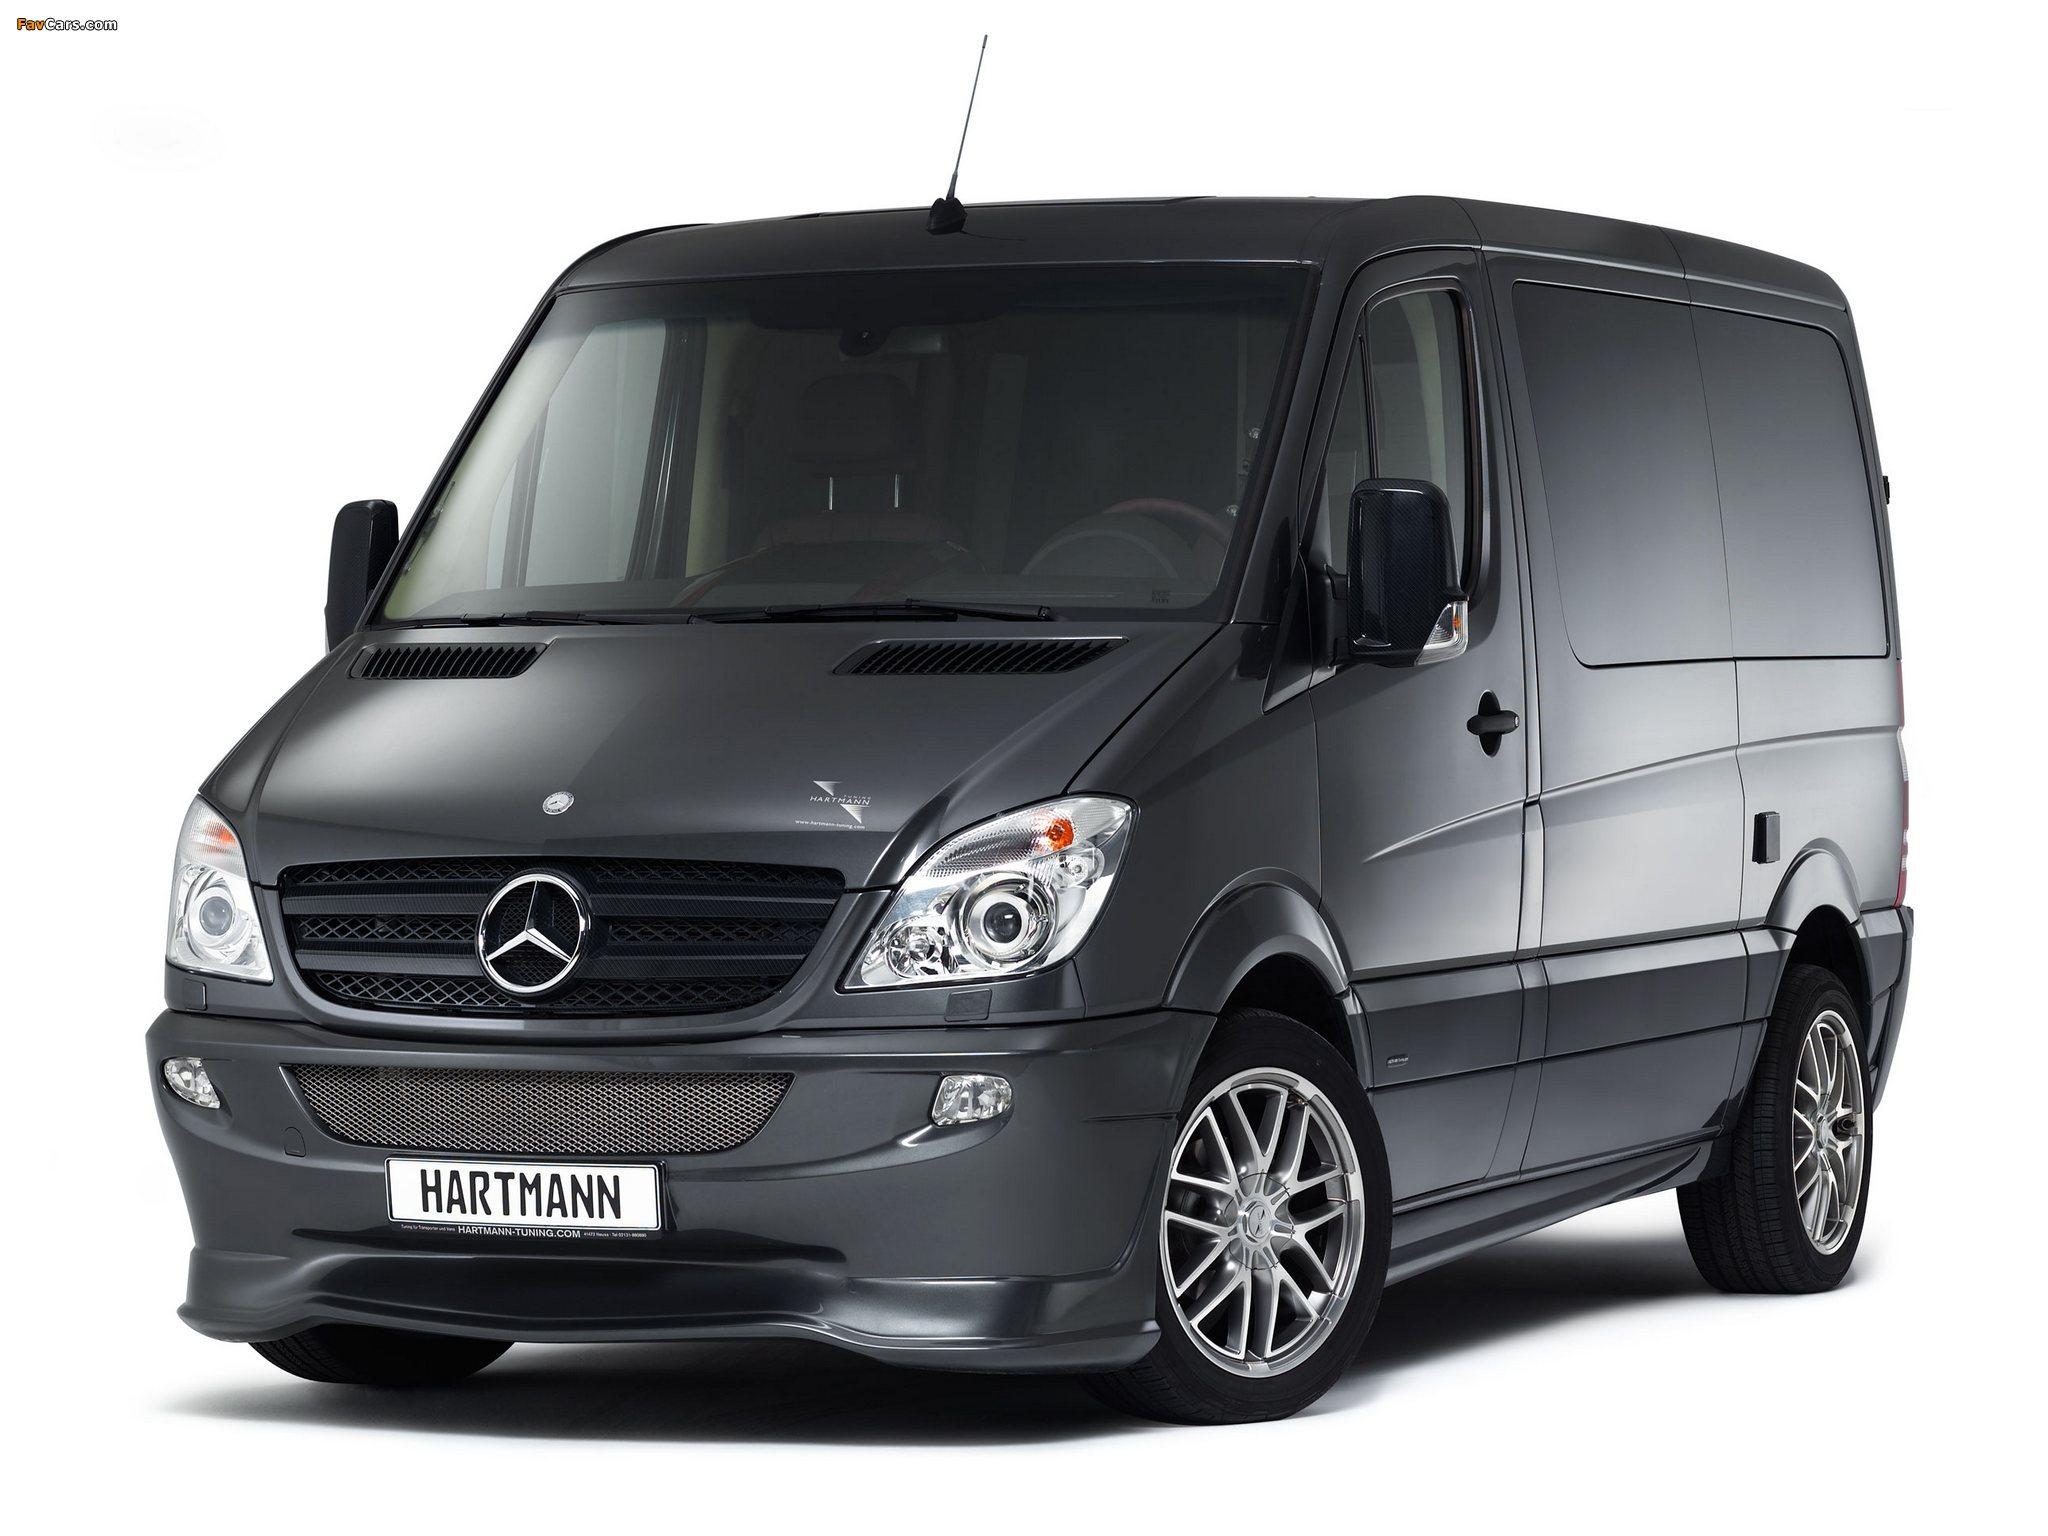 Hartmann Mercedes-Benz Sprinter SP5 Conference (W906) 2012 photos (2048 x 1536)